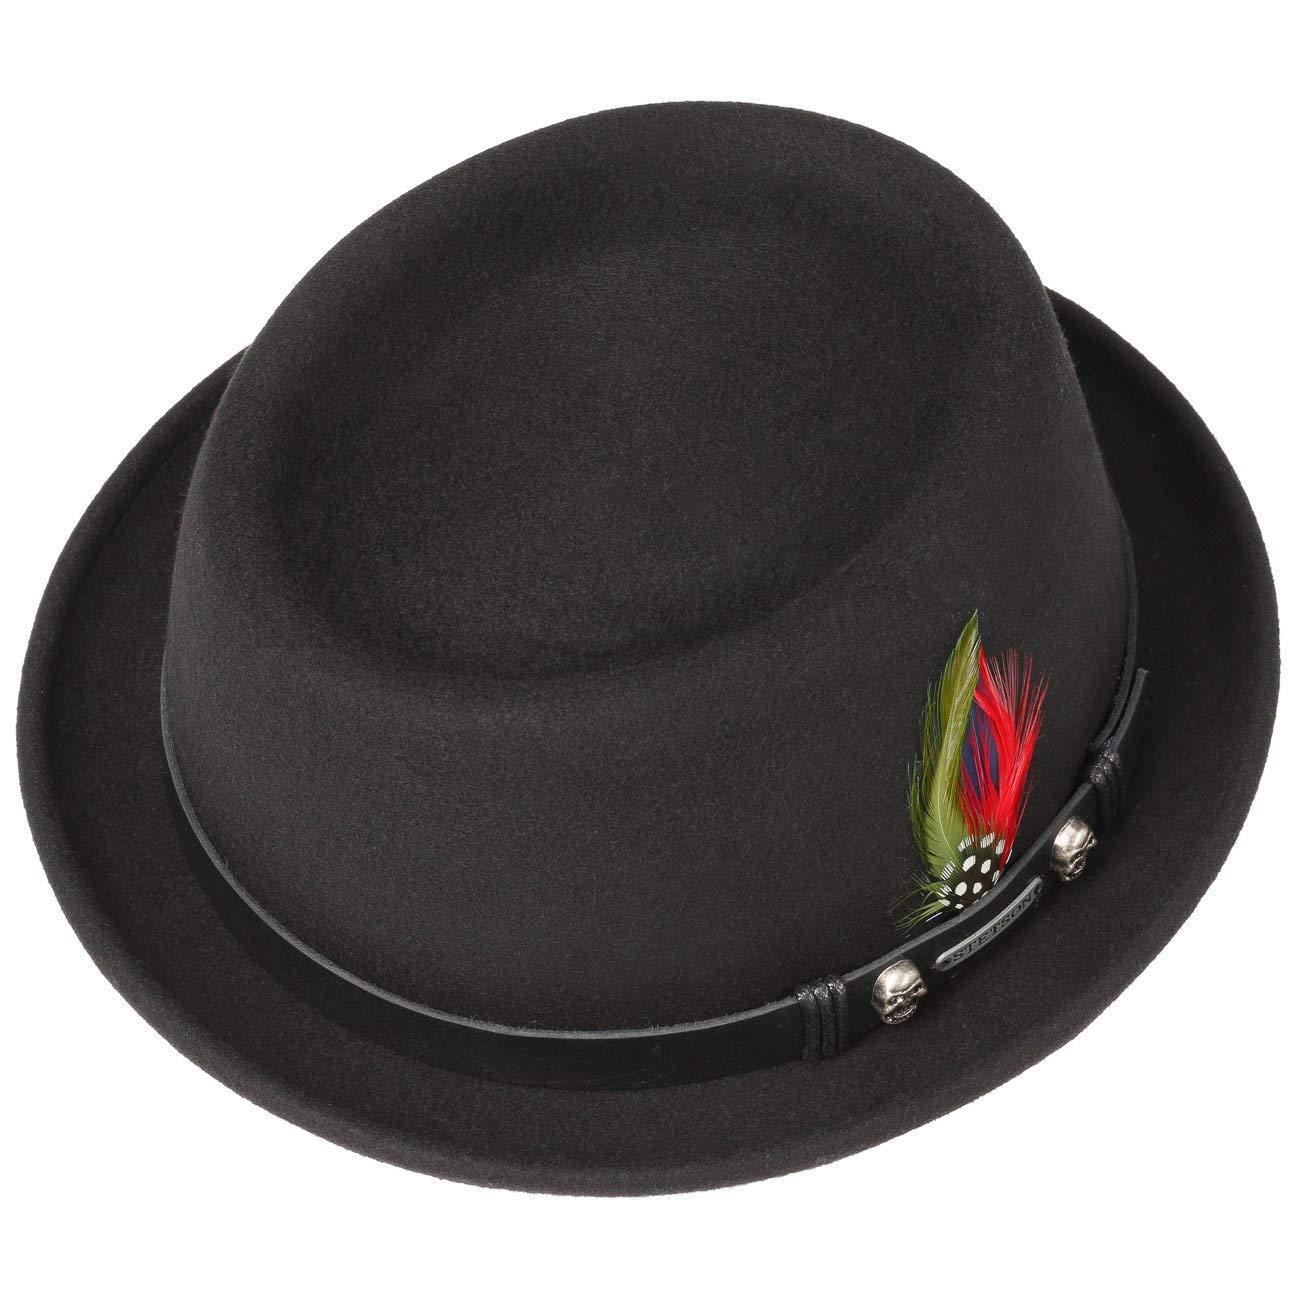 Stetson Black Pennsylvania Wool Felt Rock N Roll Classic Pork Pie Hat